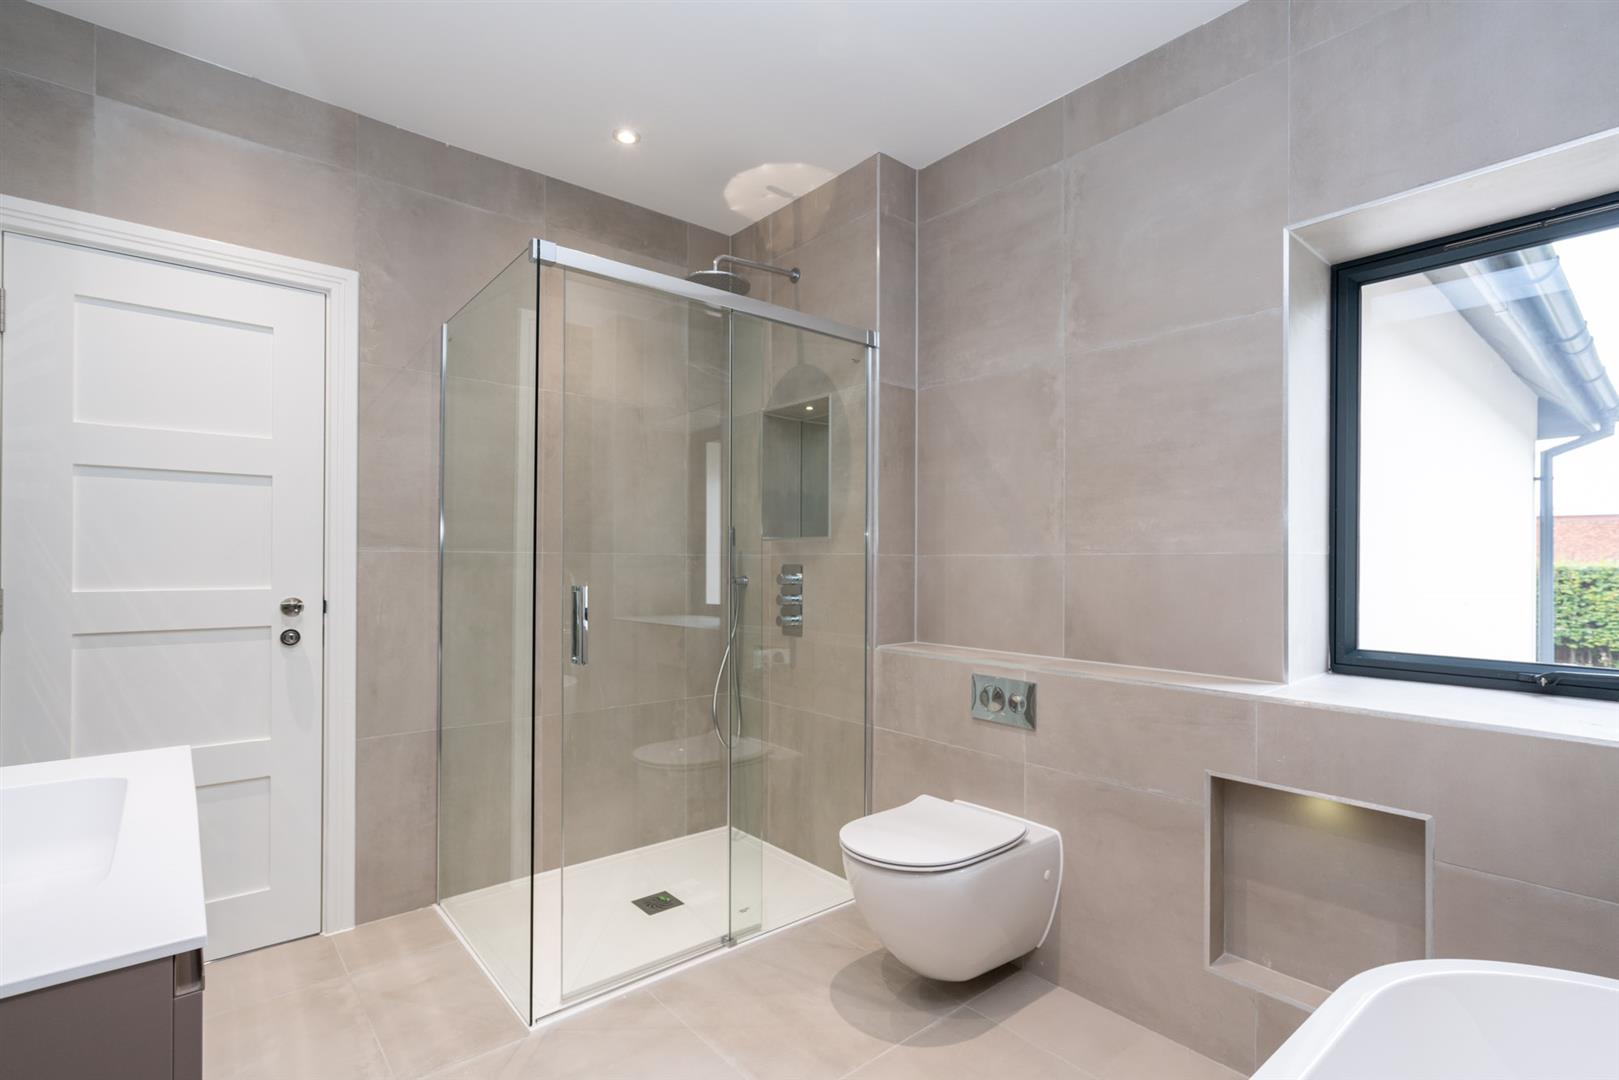 Hillcrest-3185 - bathroom 1.jpg